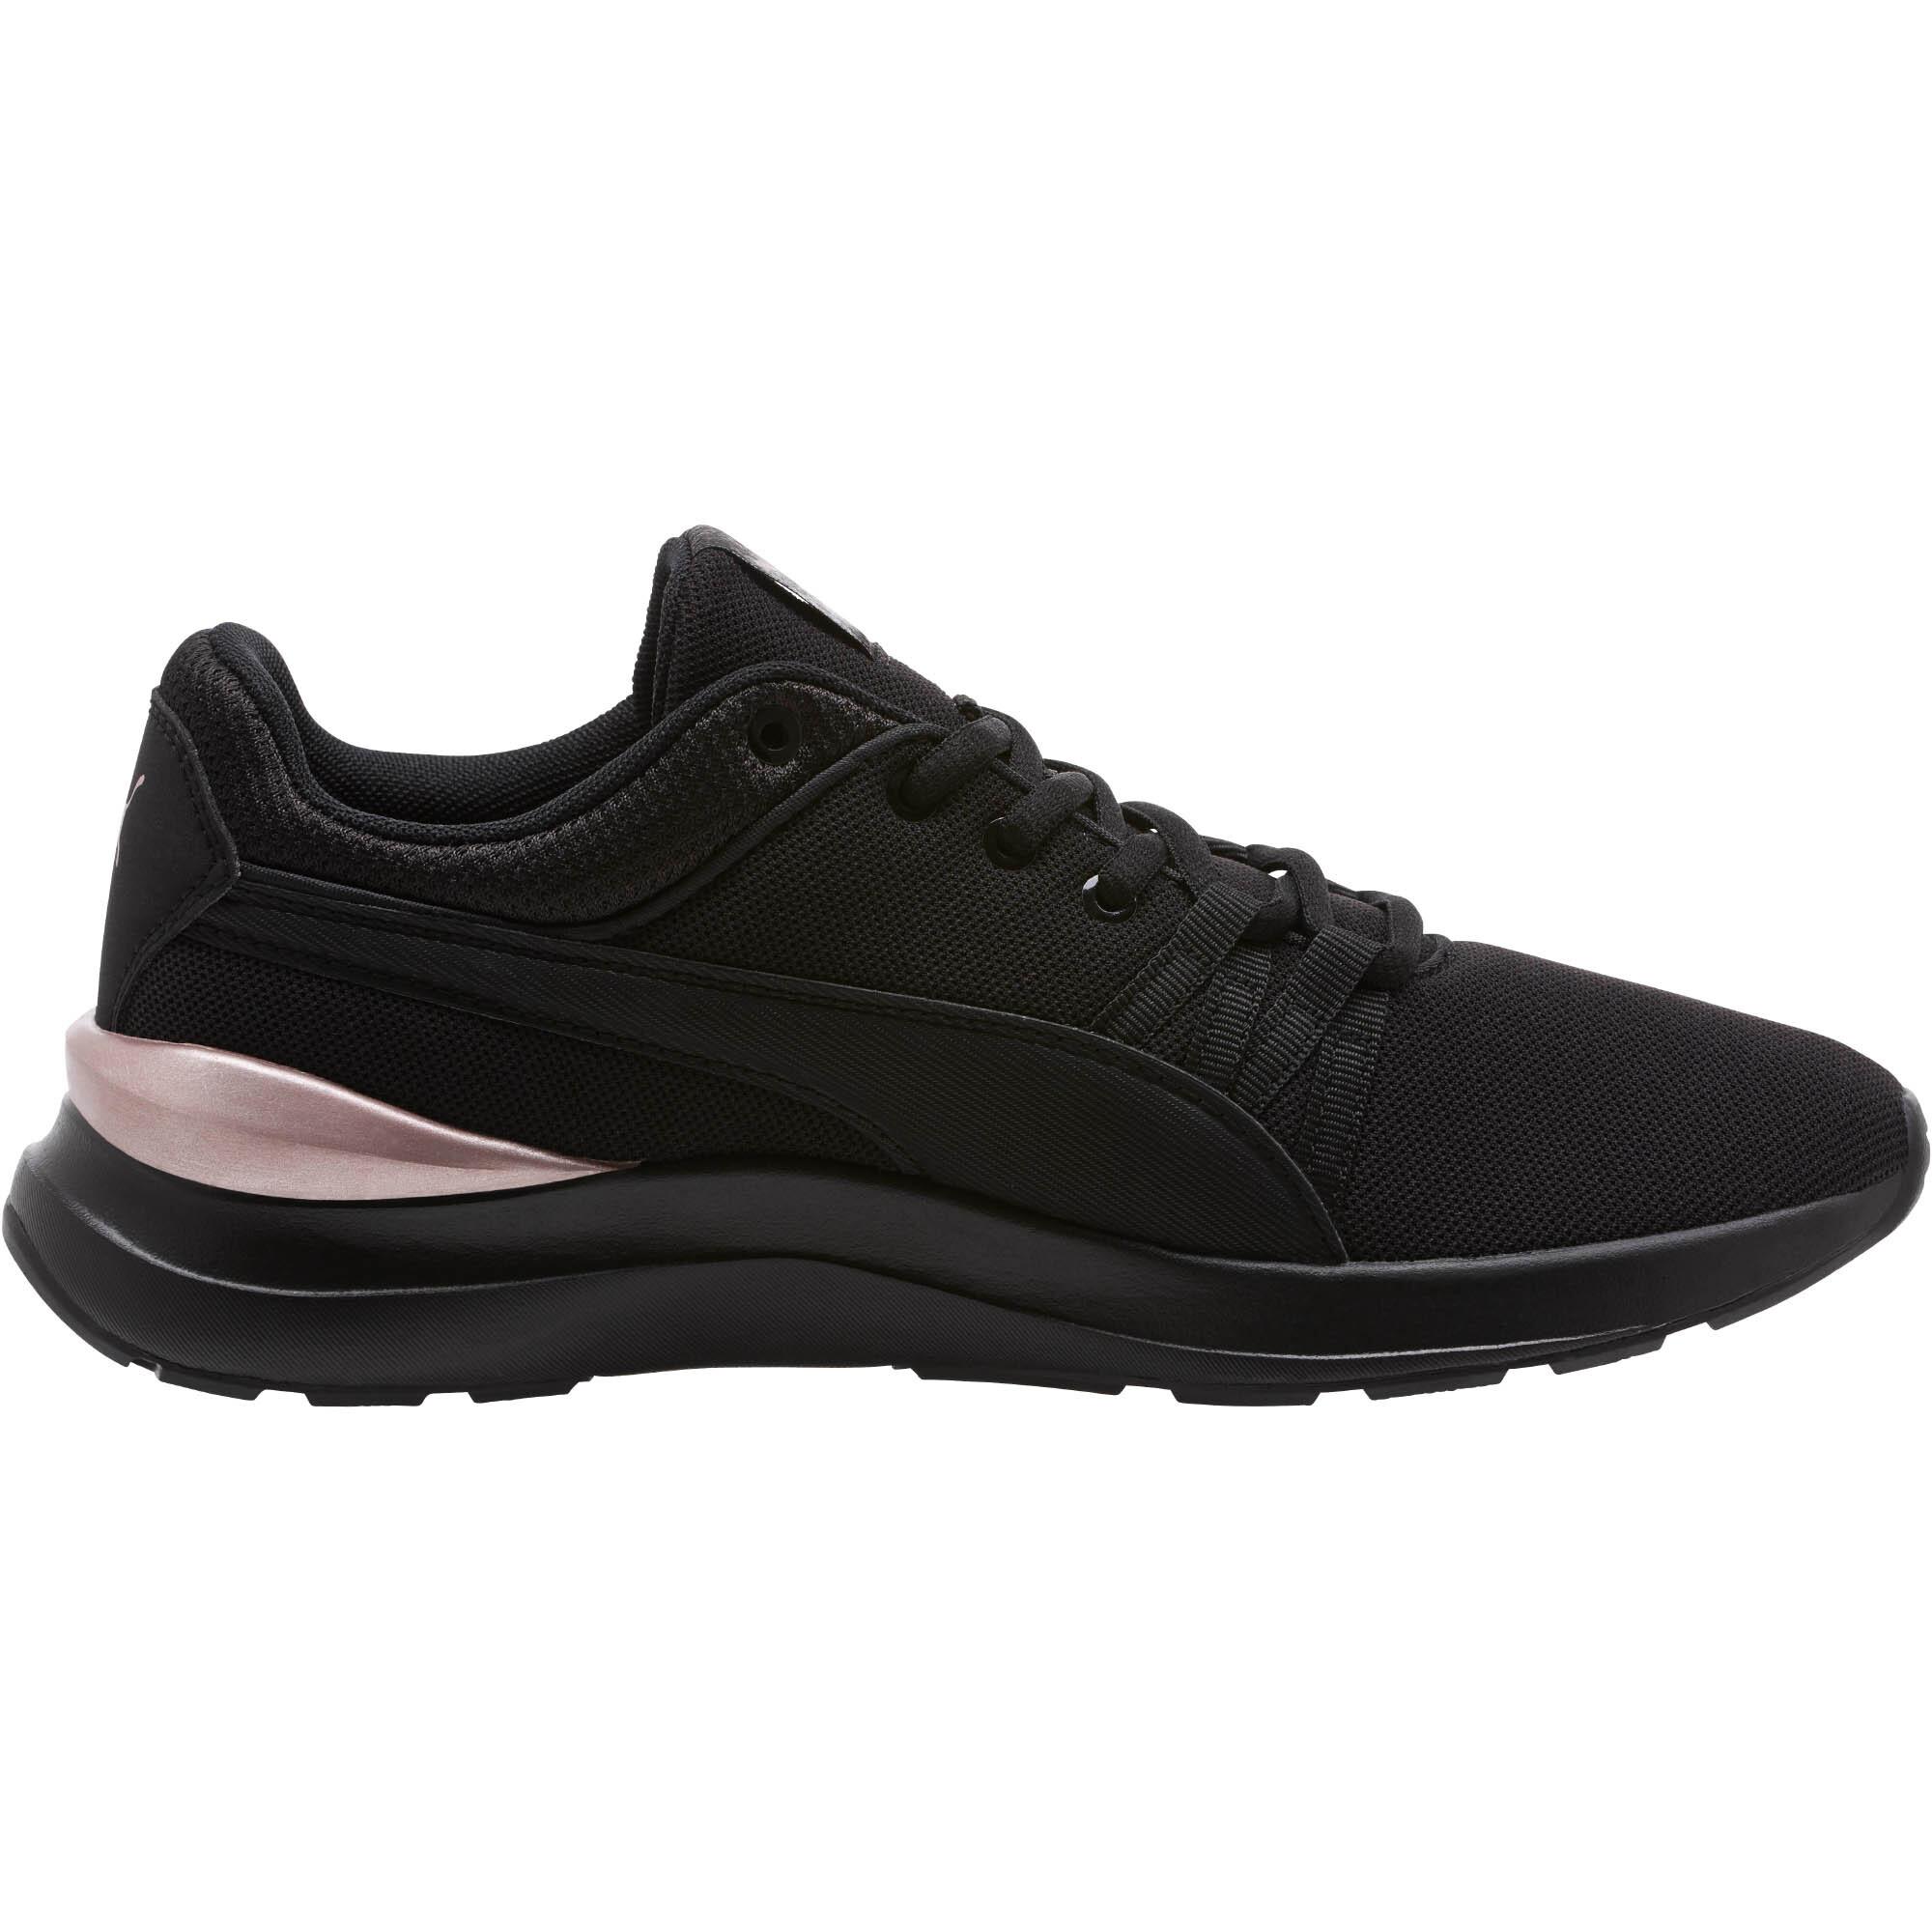 PUMA-Adela-Mesh-Women-s-Sneakers-Women-Shoe-Basics thumbnail 10